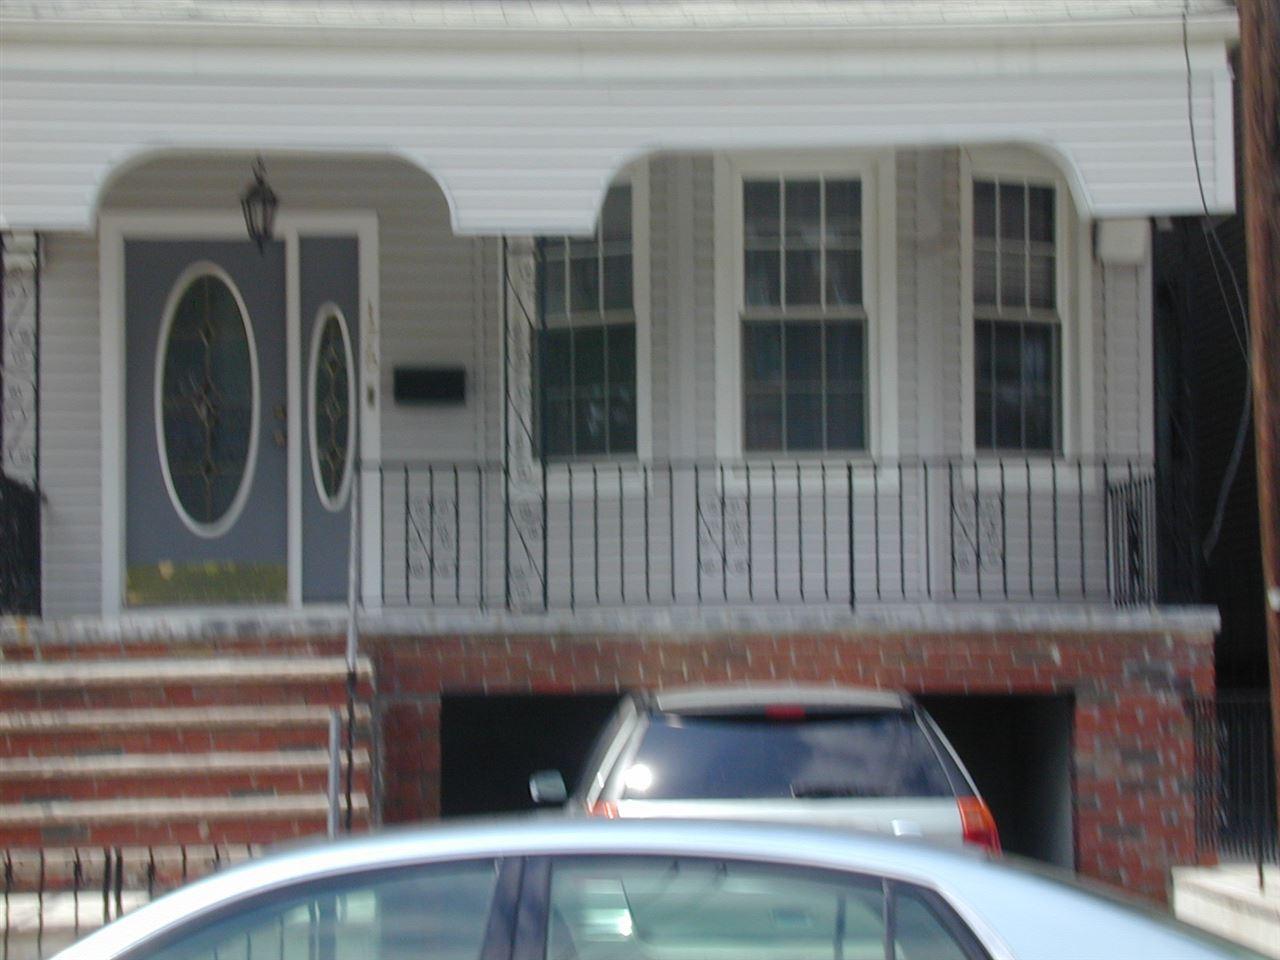 175 WEGMAN PARKWAY, JC, Greenville, NJ 07305